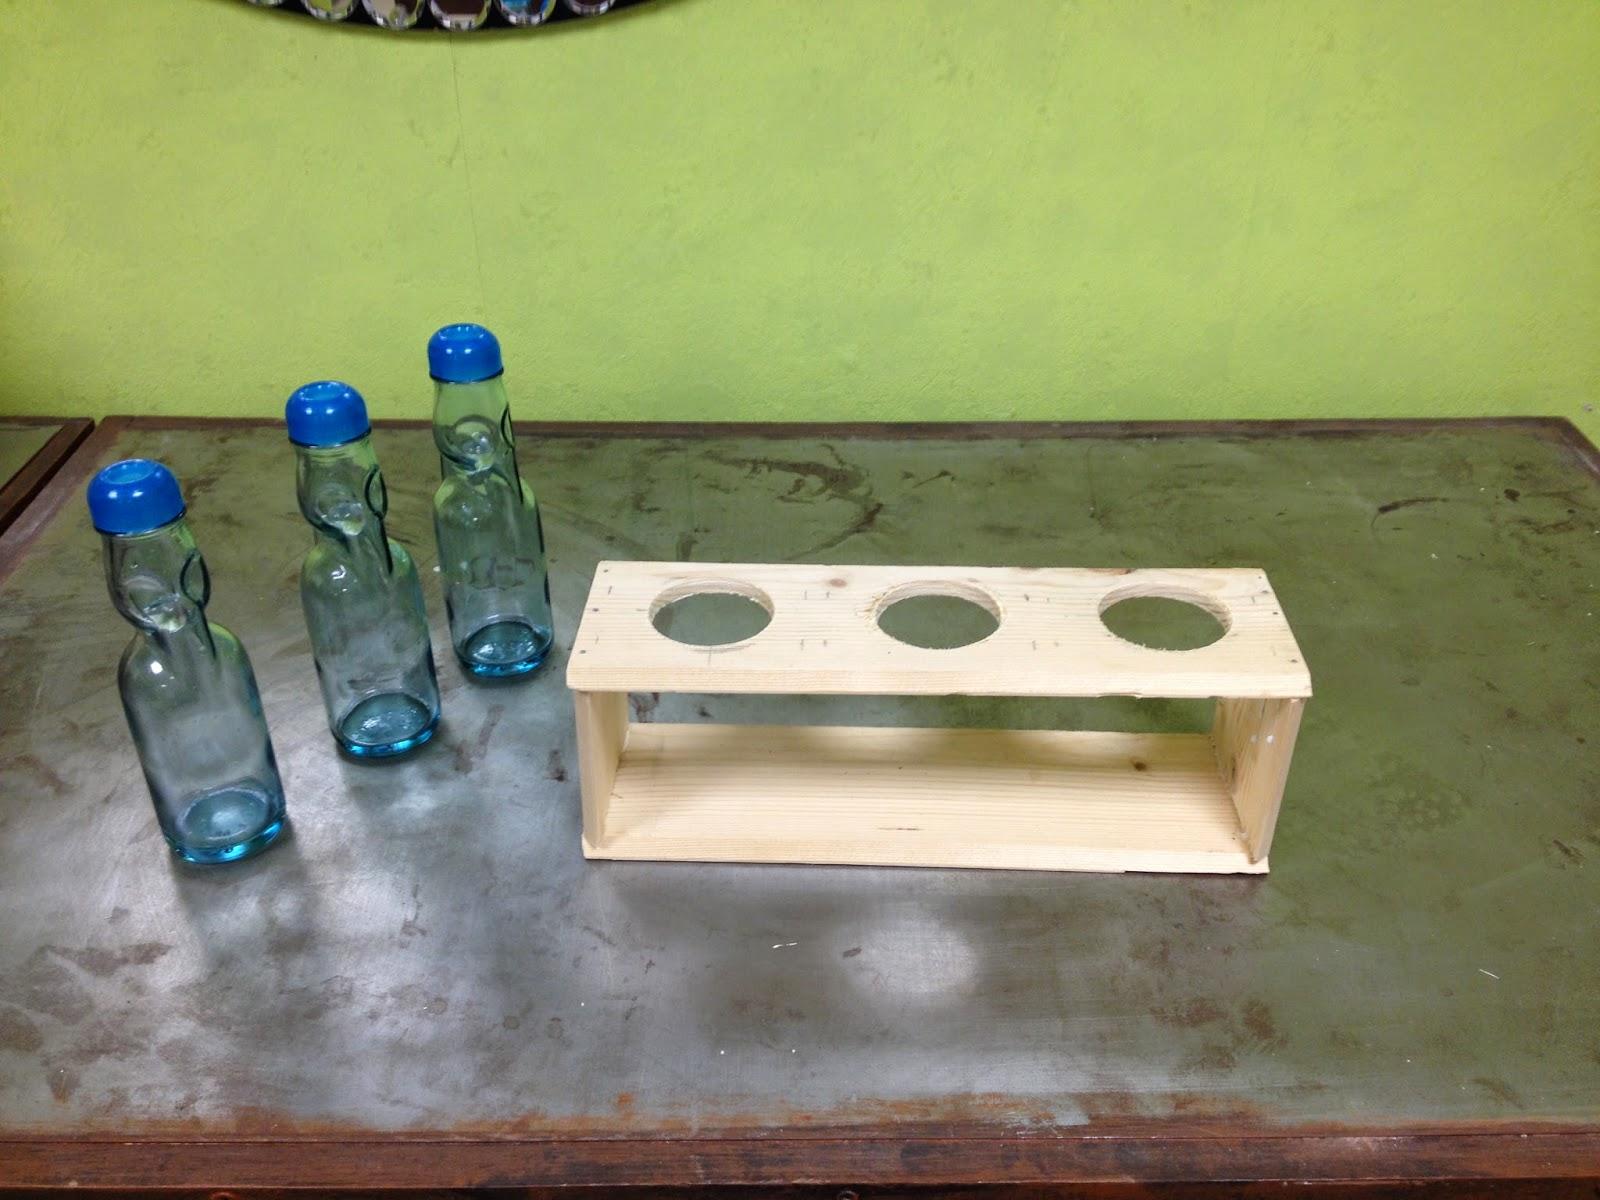 projet cours enfants recyclage bouteille leroy merlin. Black Bedroom Furniture Sets. Home Design Ideas